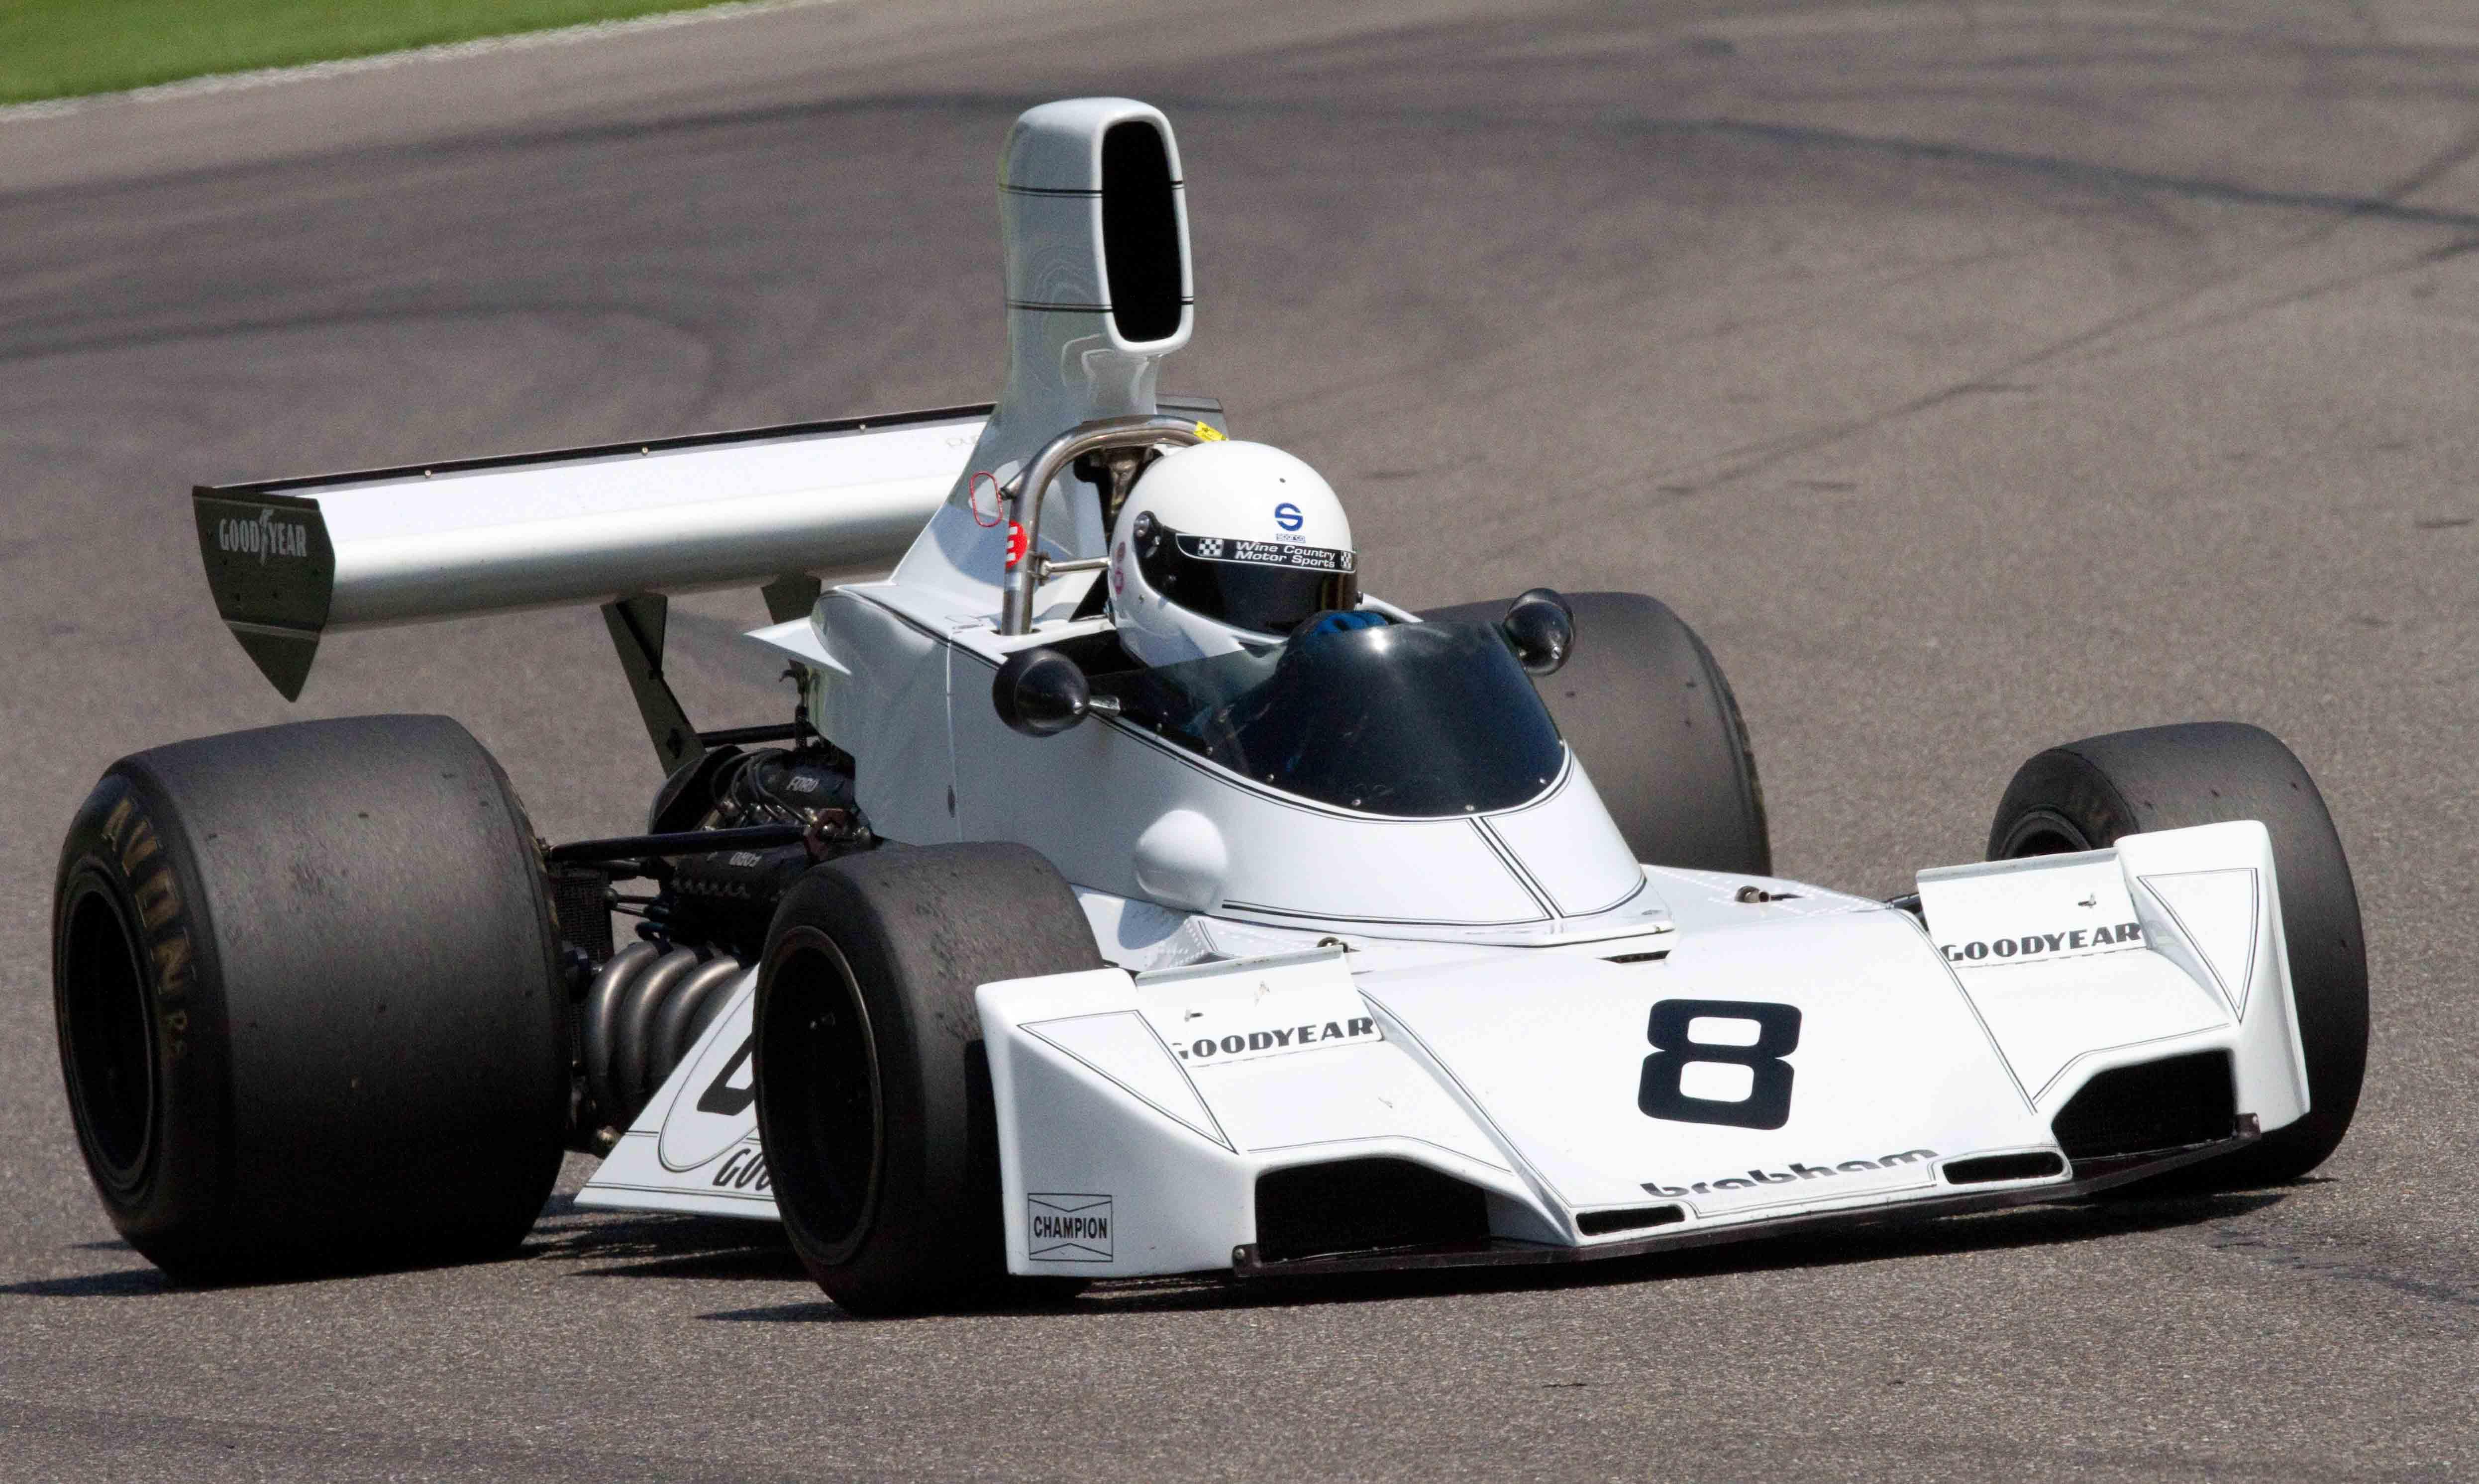 Barber Motorsports Park >> File:Brabham BT44 at Barber 01.jpg - Wikimedia Commons